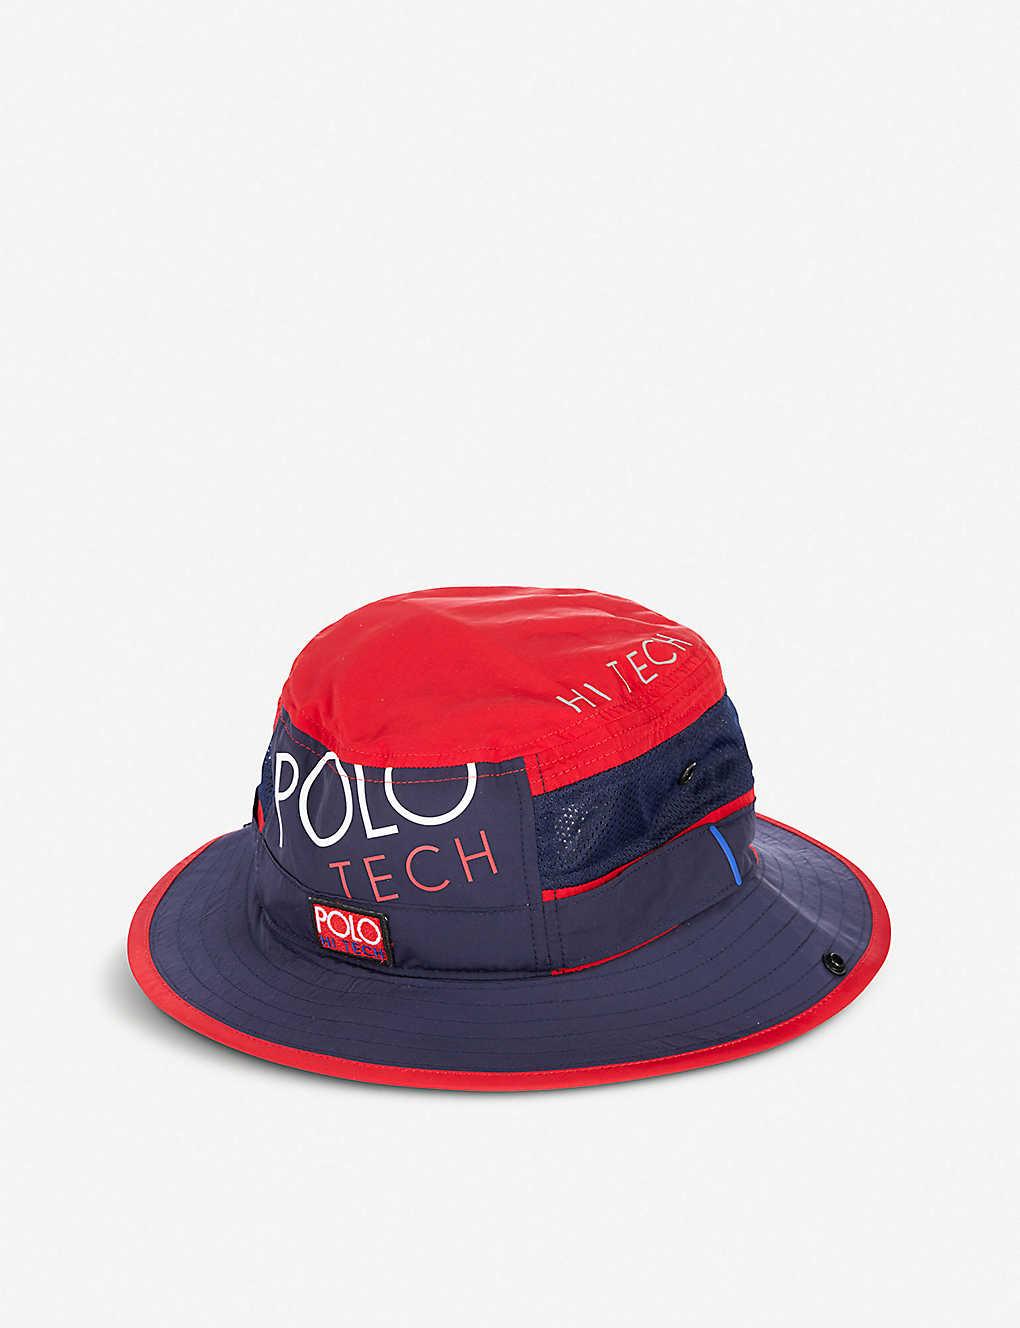 f00005164bd8d Hi Tech Booney shell and mesh hat - Newport navyred ...